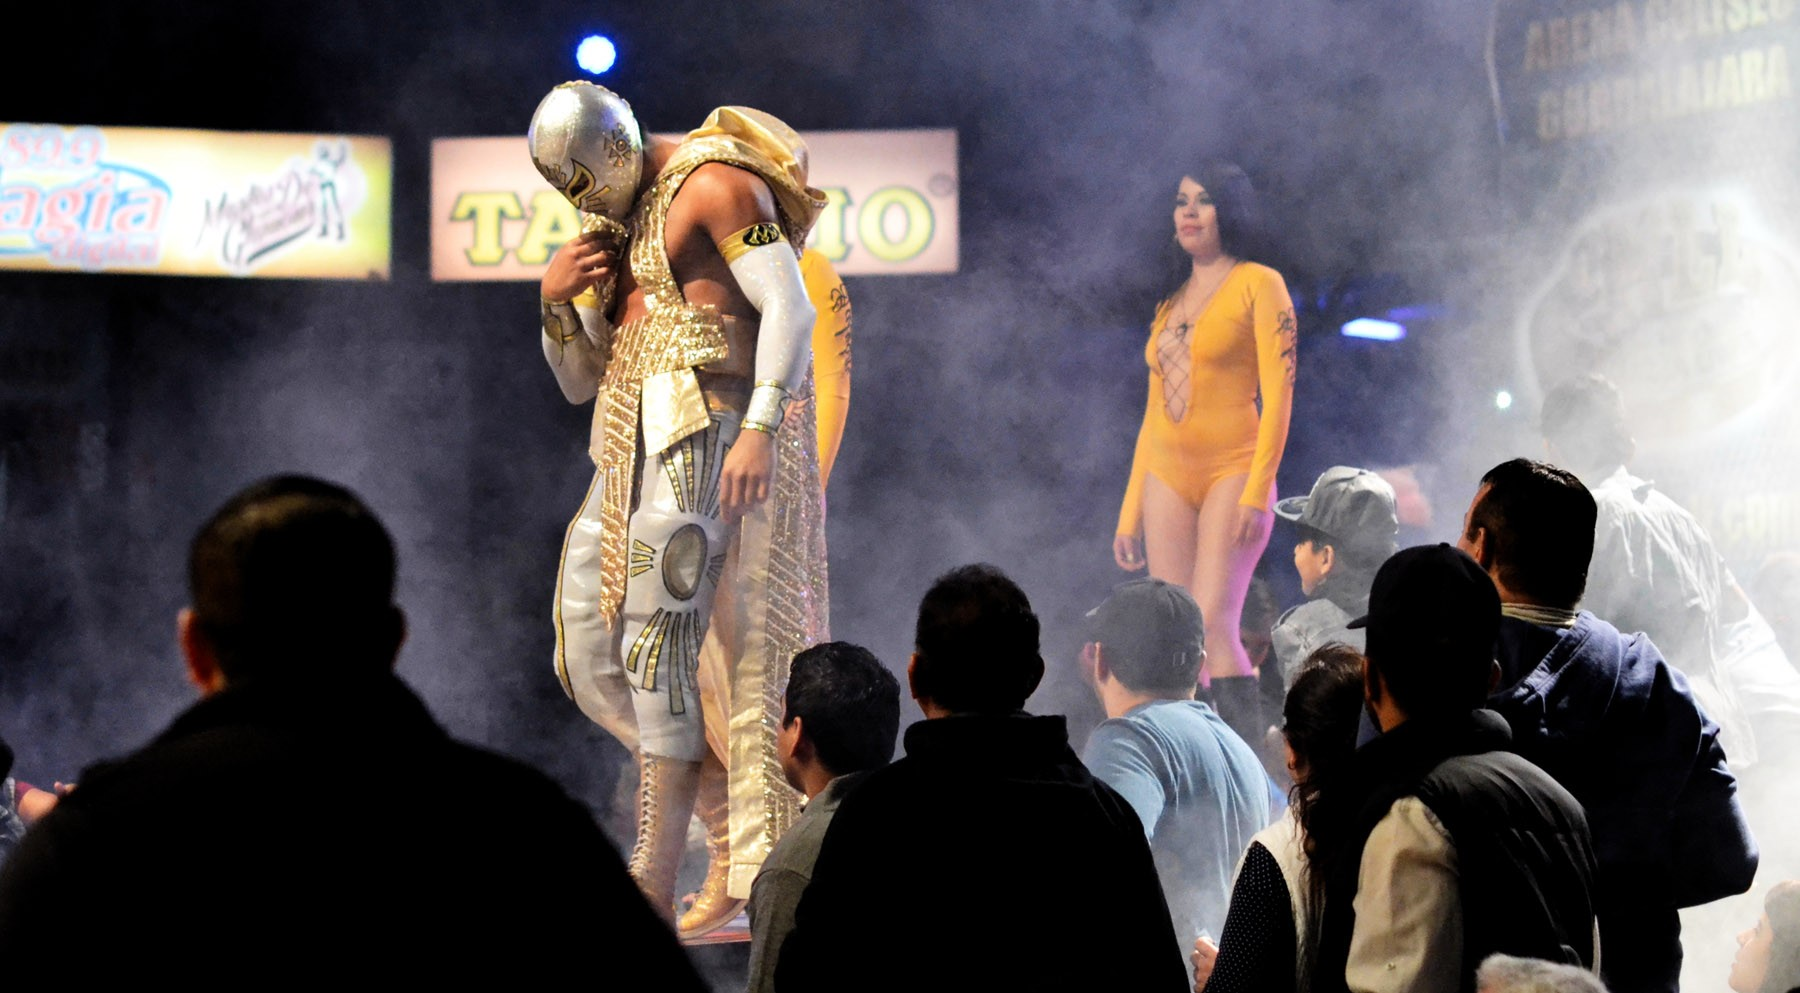 Mistico aka Luis Ignacio Urive Alvirde enters the ring